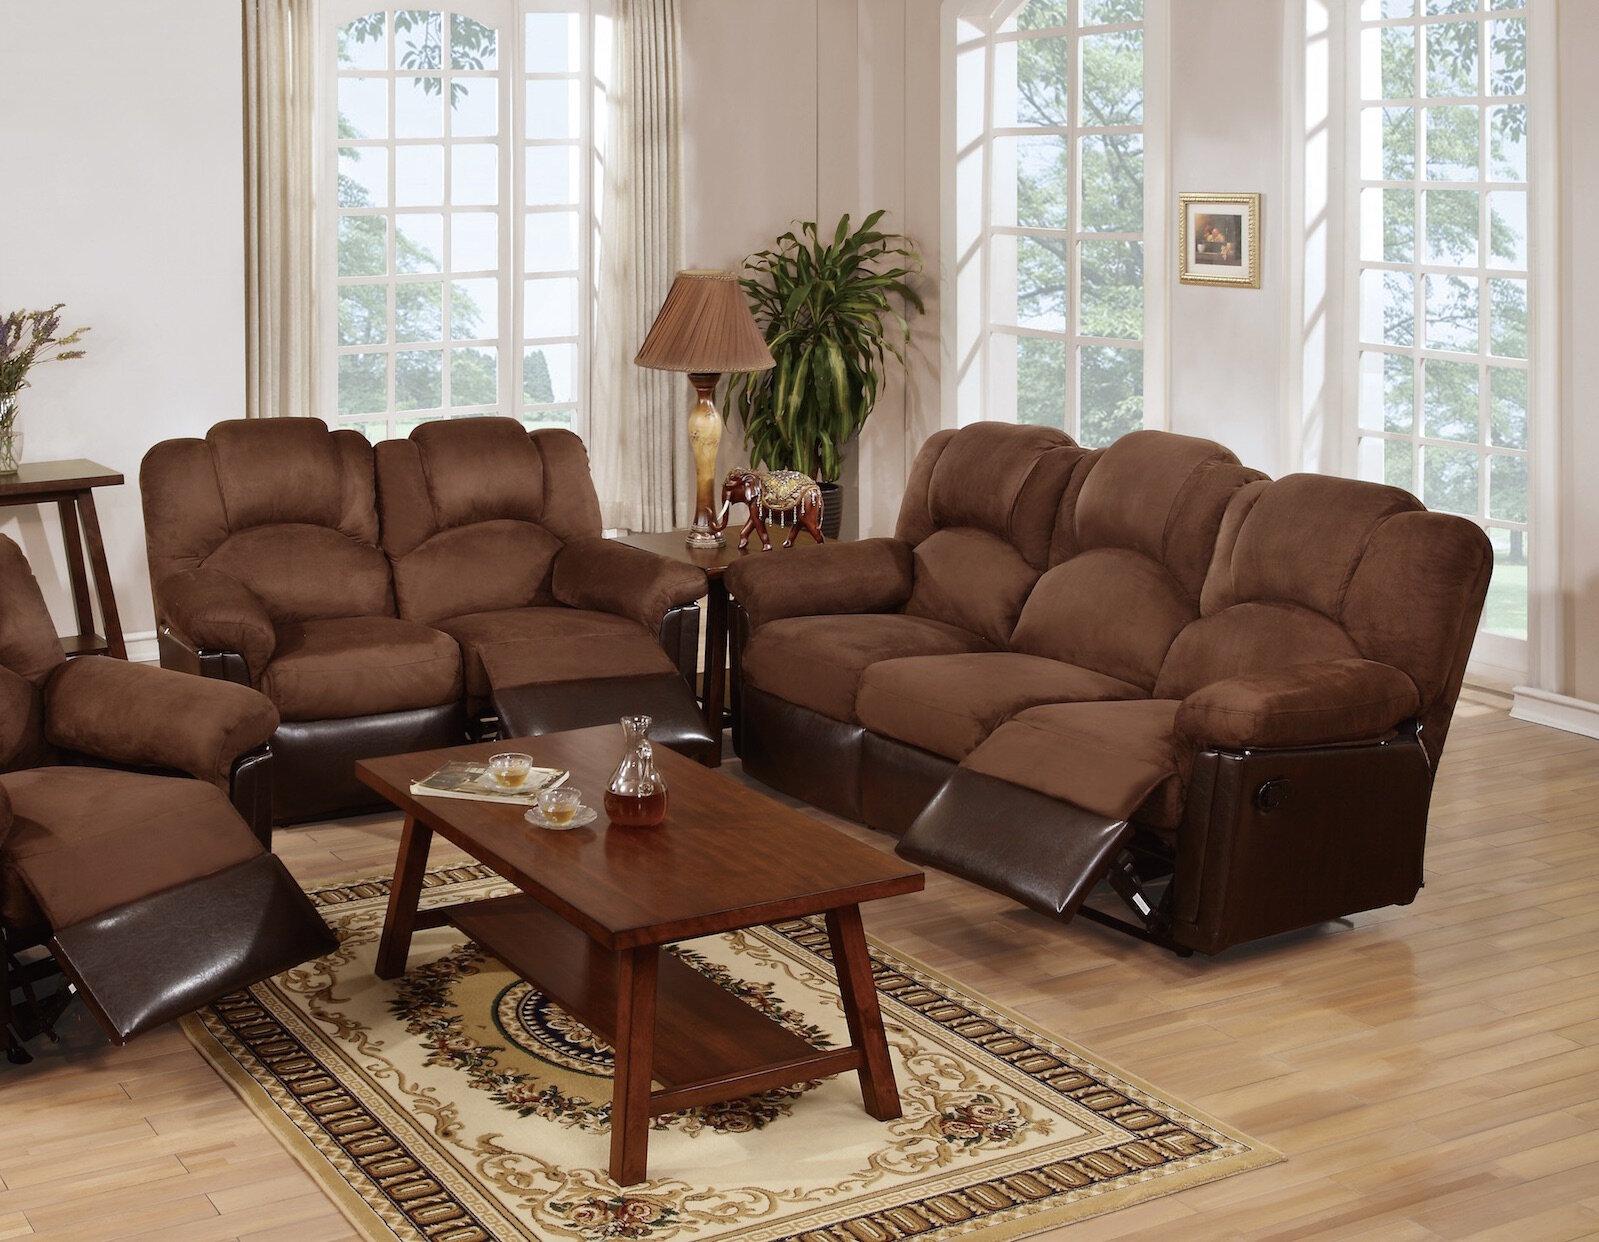 Reclining Living Room Sets | Red Barrel Studio Ingaret Reclining Living Room Set Reviews Wayfair